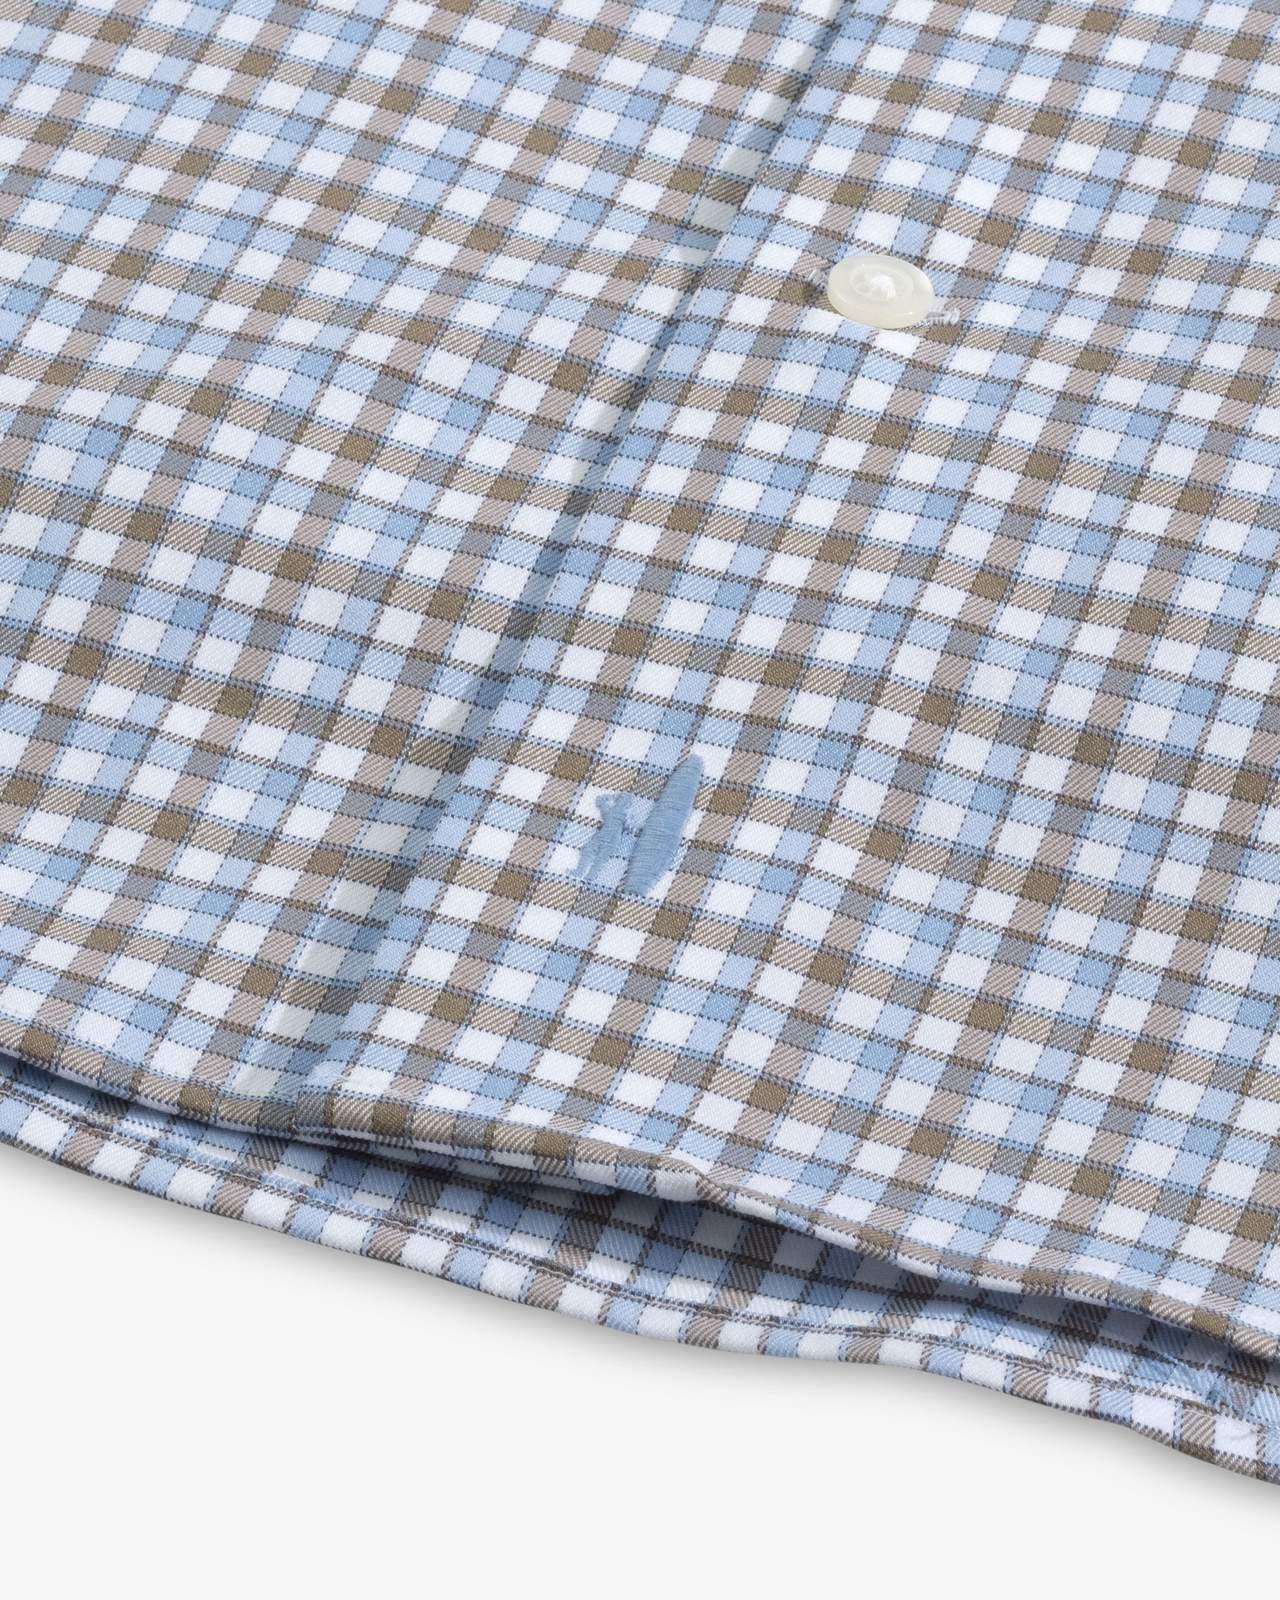 JOHNNIE-O Johnnie-O Redmond Performance Button Down Shirt